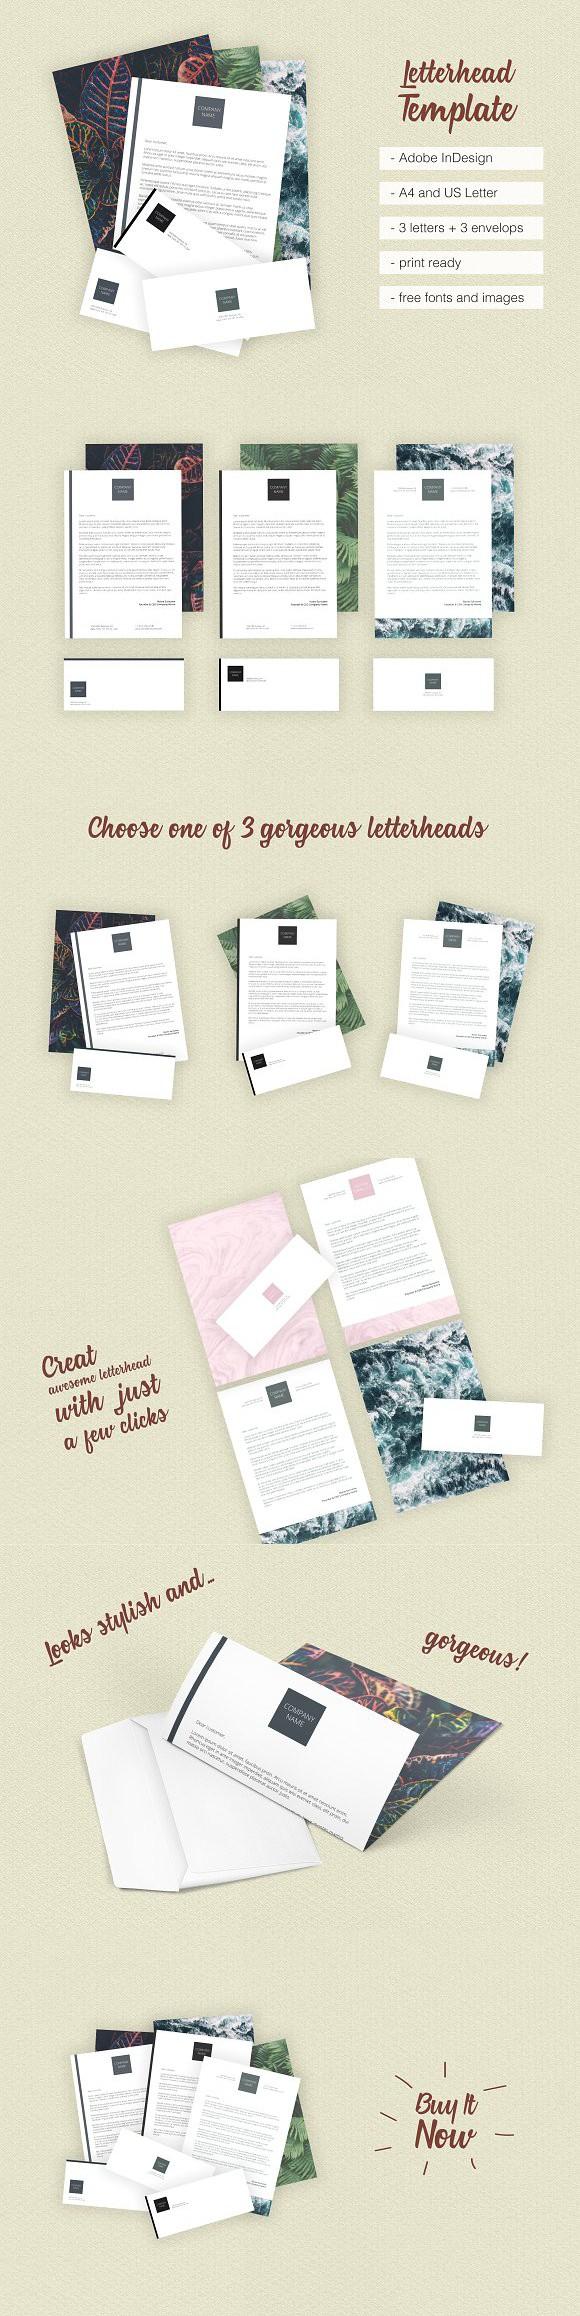 letter format on letterhead%0A Asian Dream Letterhead Template  Stationery Templates